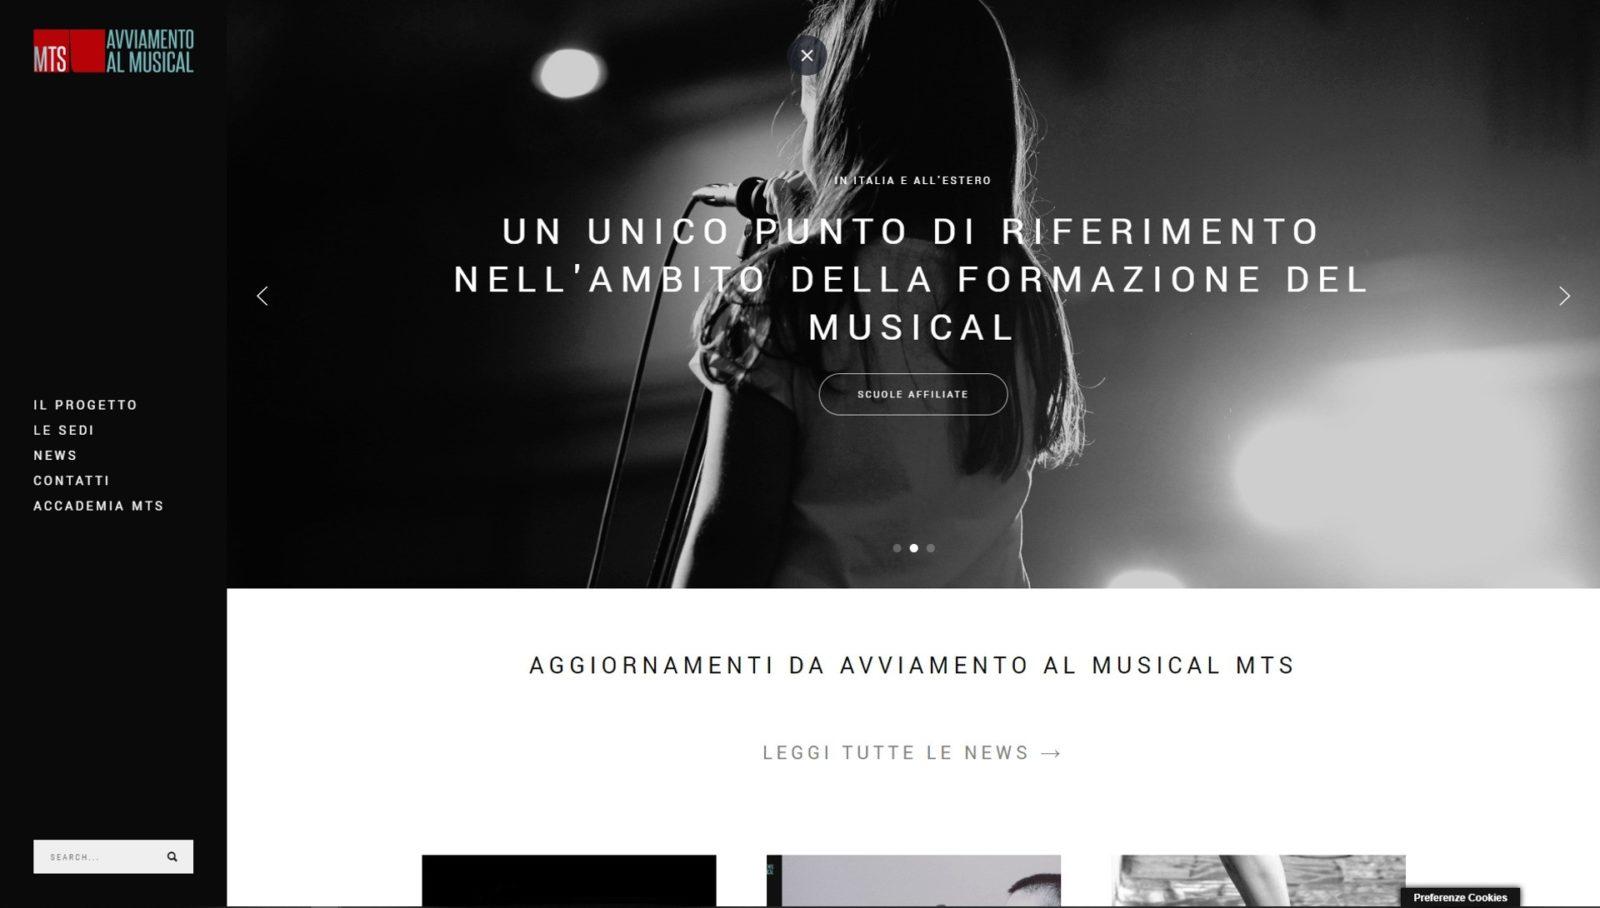 MTS AVVIAMENTO AL MUSICAL – WEBSITE